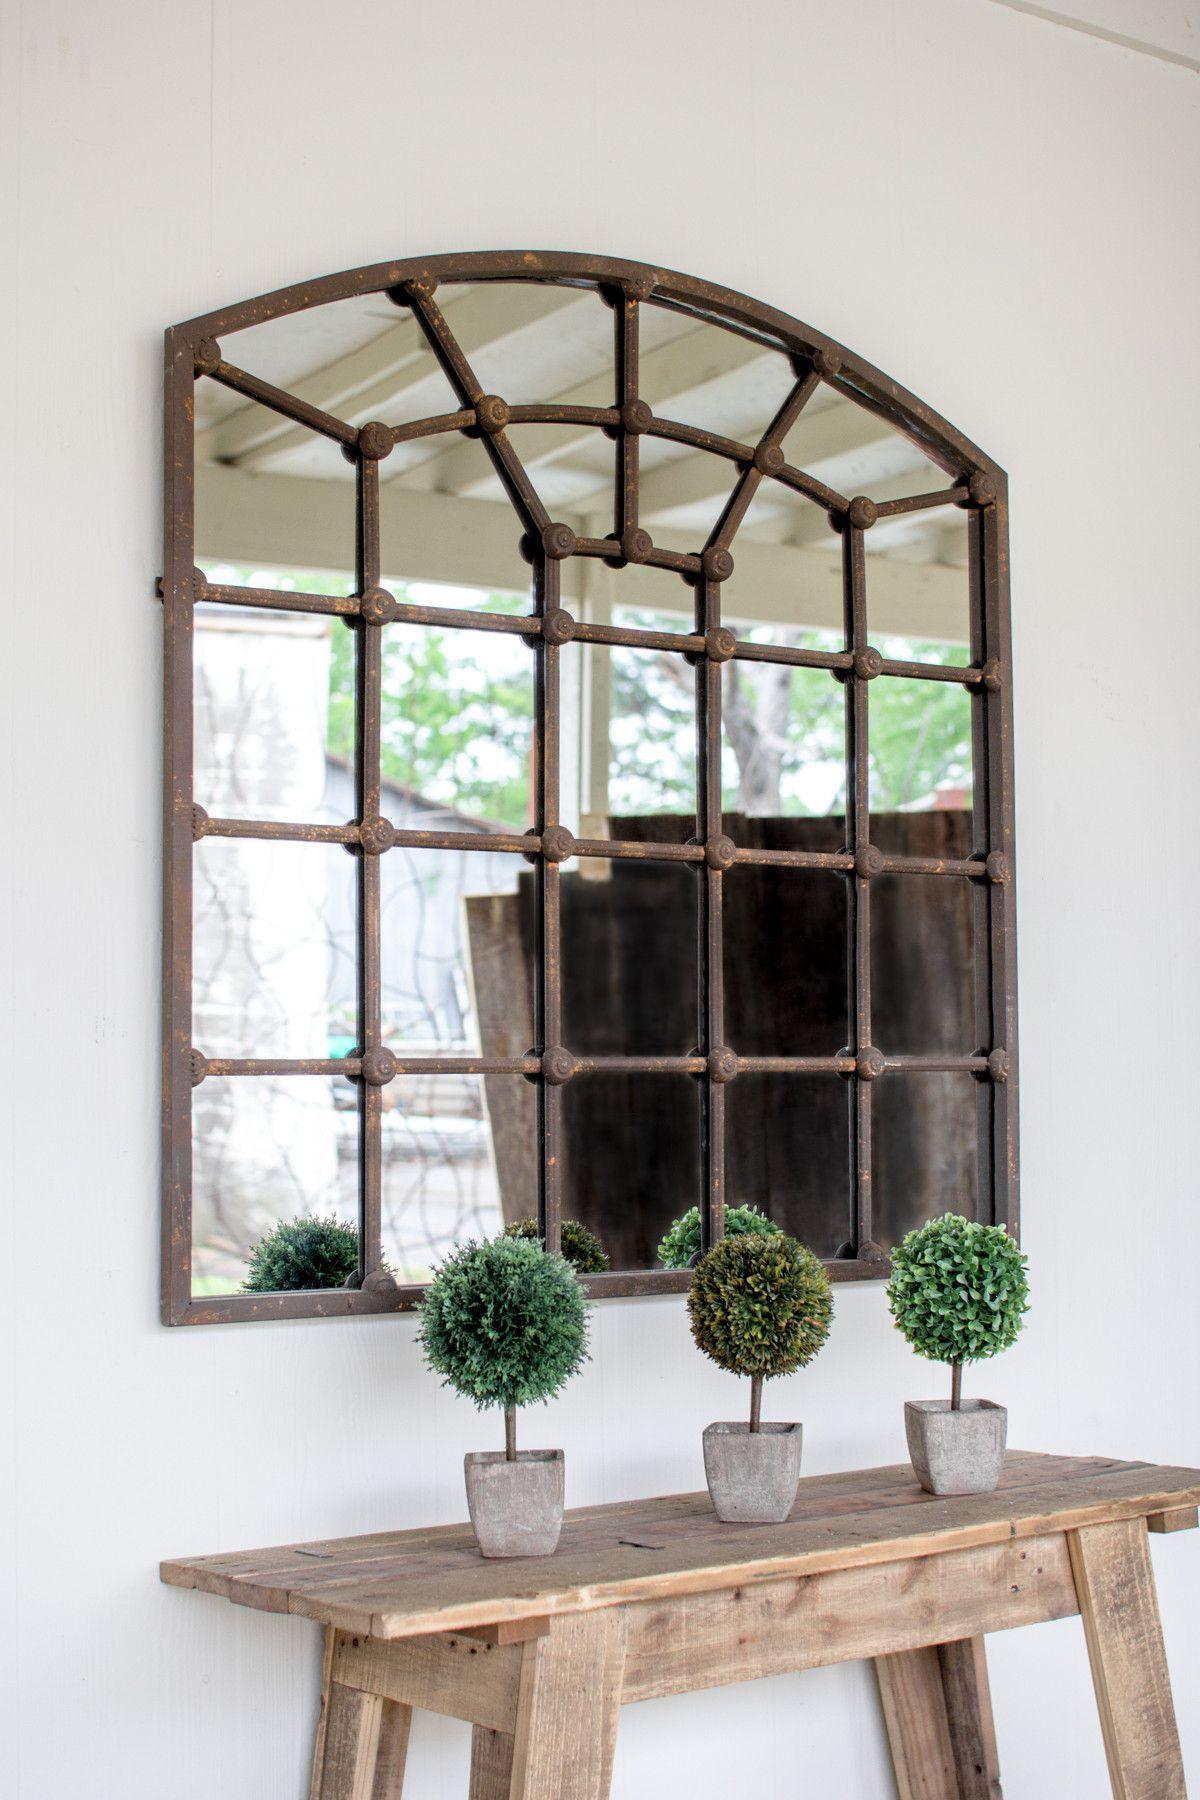 Arched iron mirror tuscan design decor rustic furniture